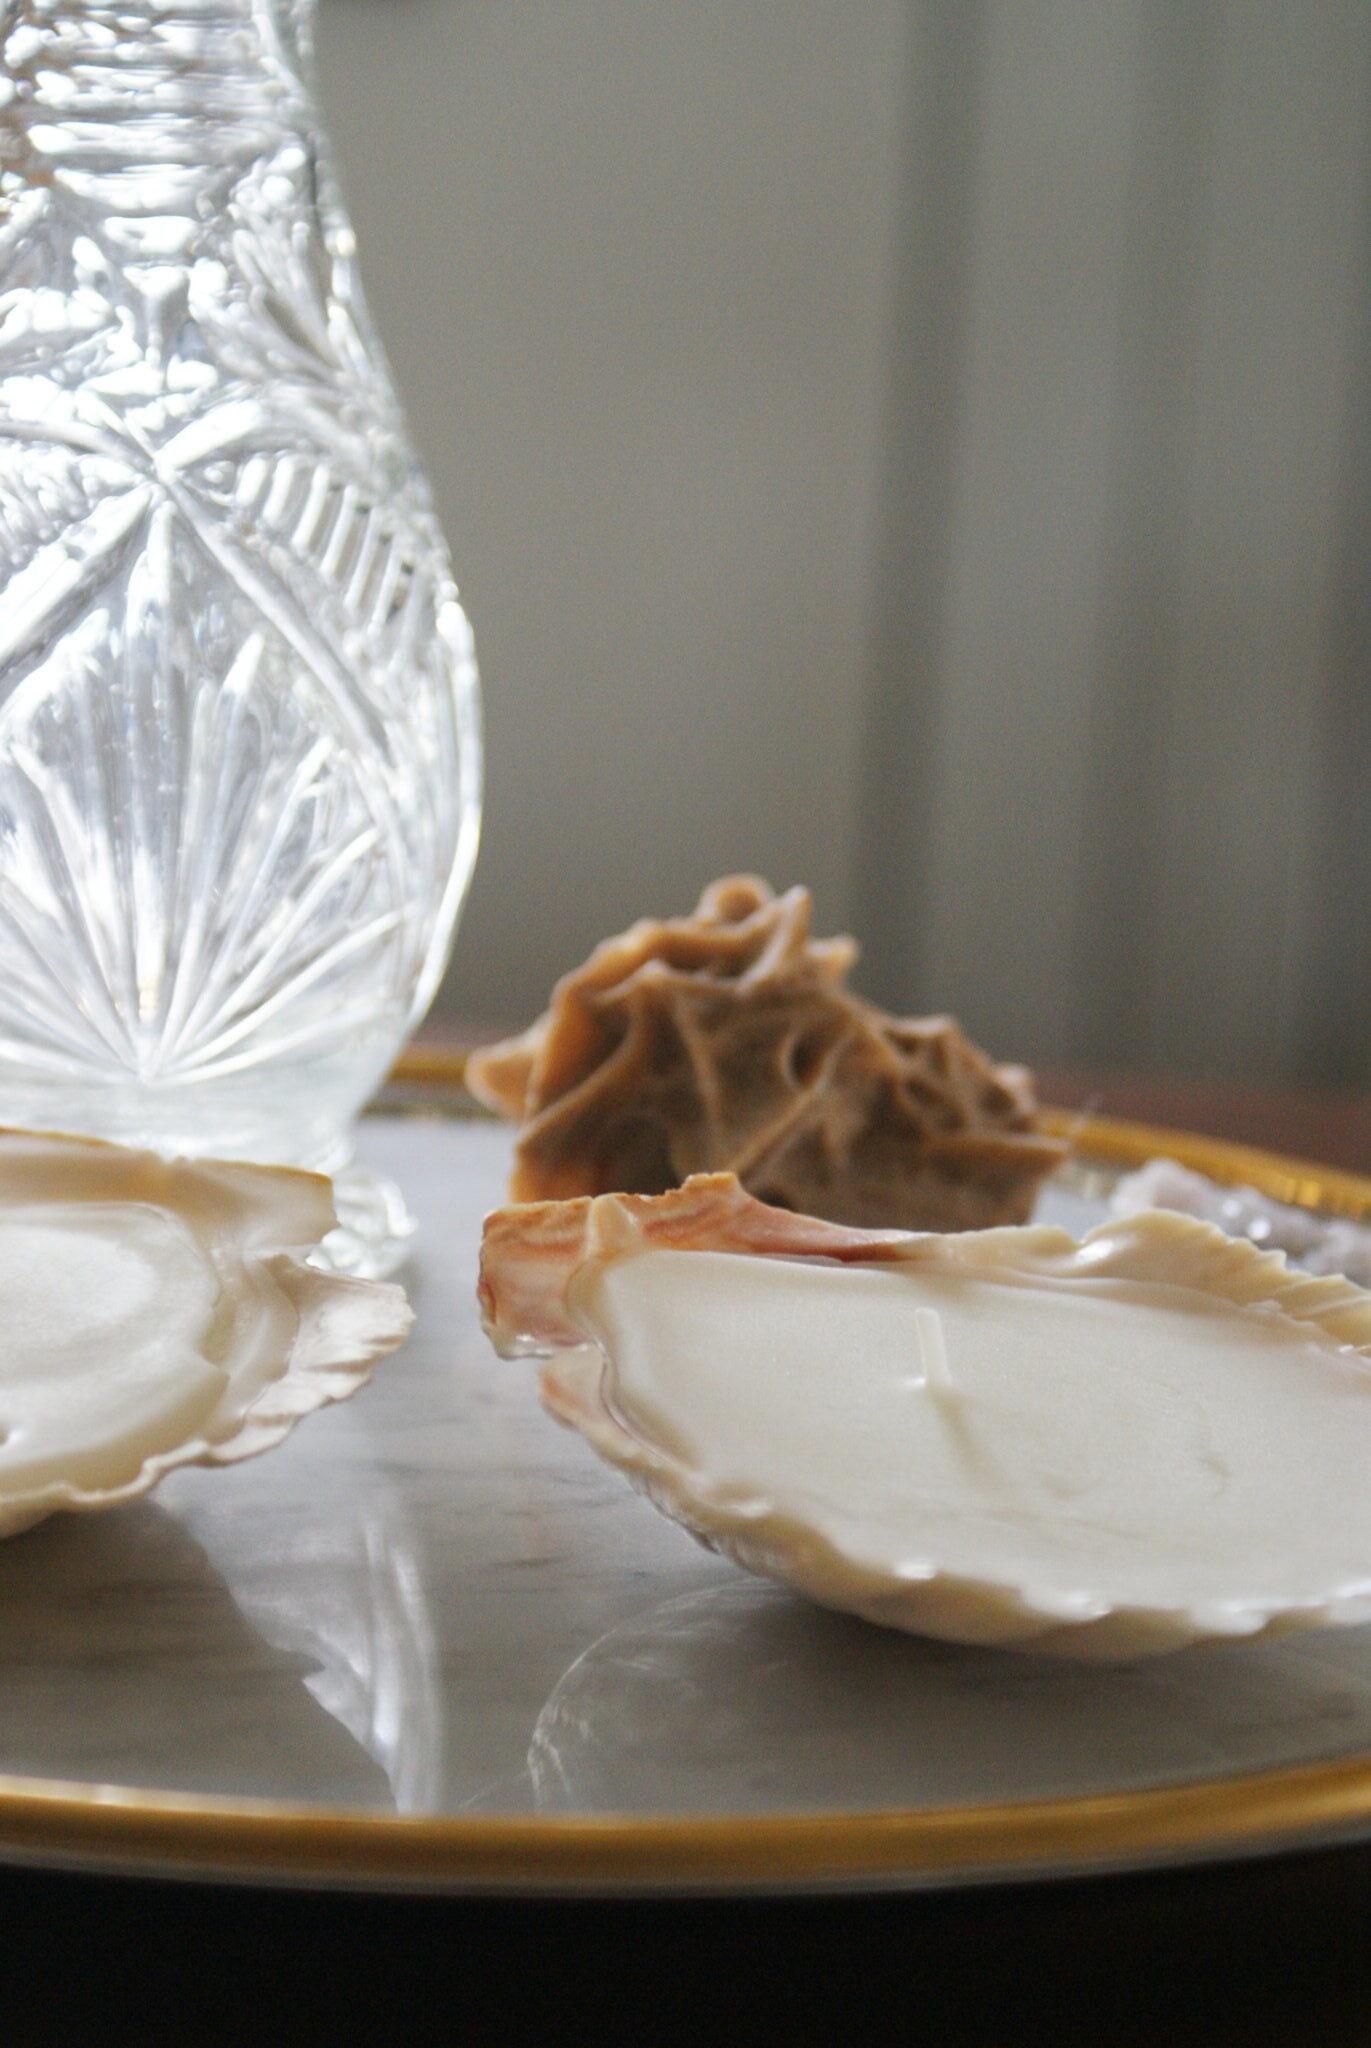 diy sea shell candles ultimate easy quick tutorial how make home decor aesthetic candele conchiglia conchiglie faidate casa come fare francinesplaceblog guide